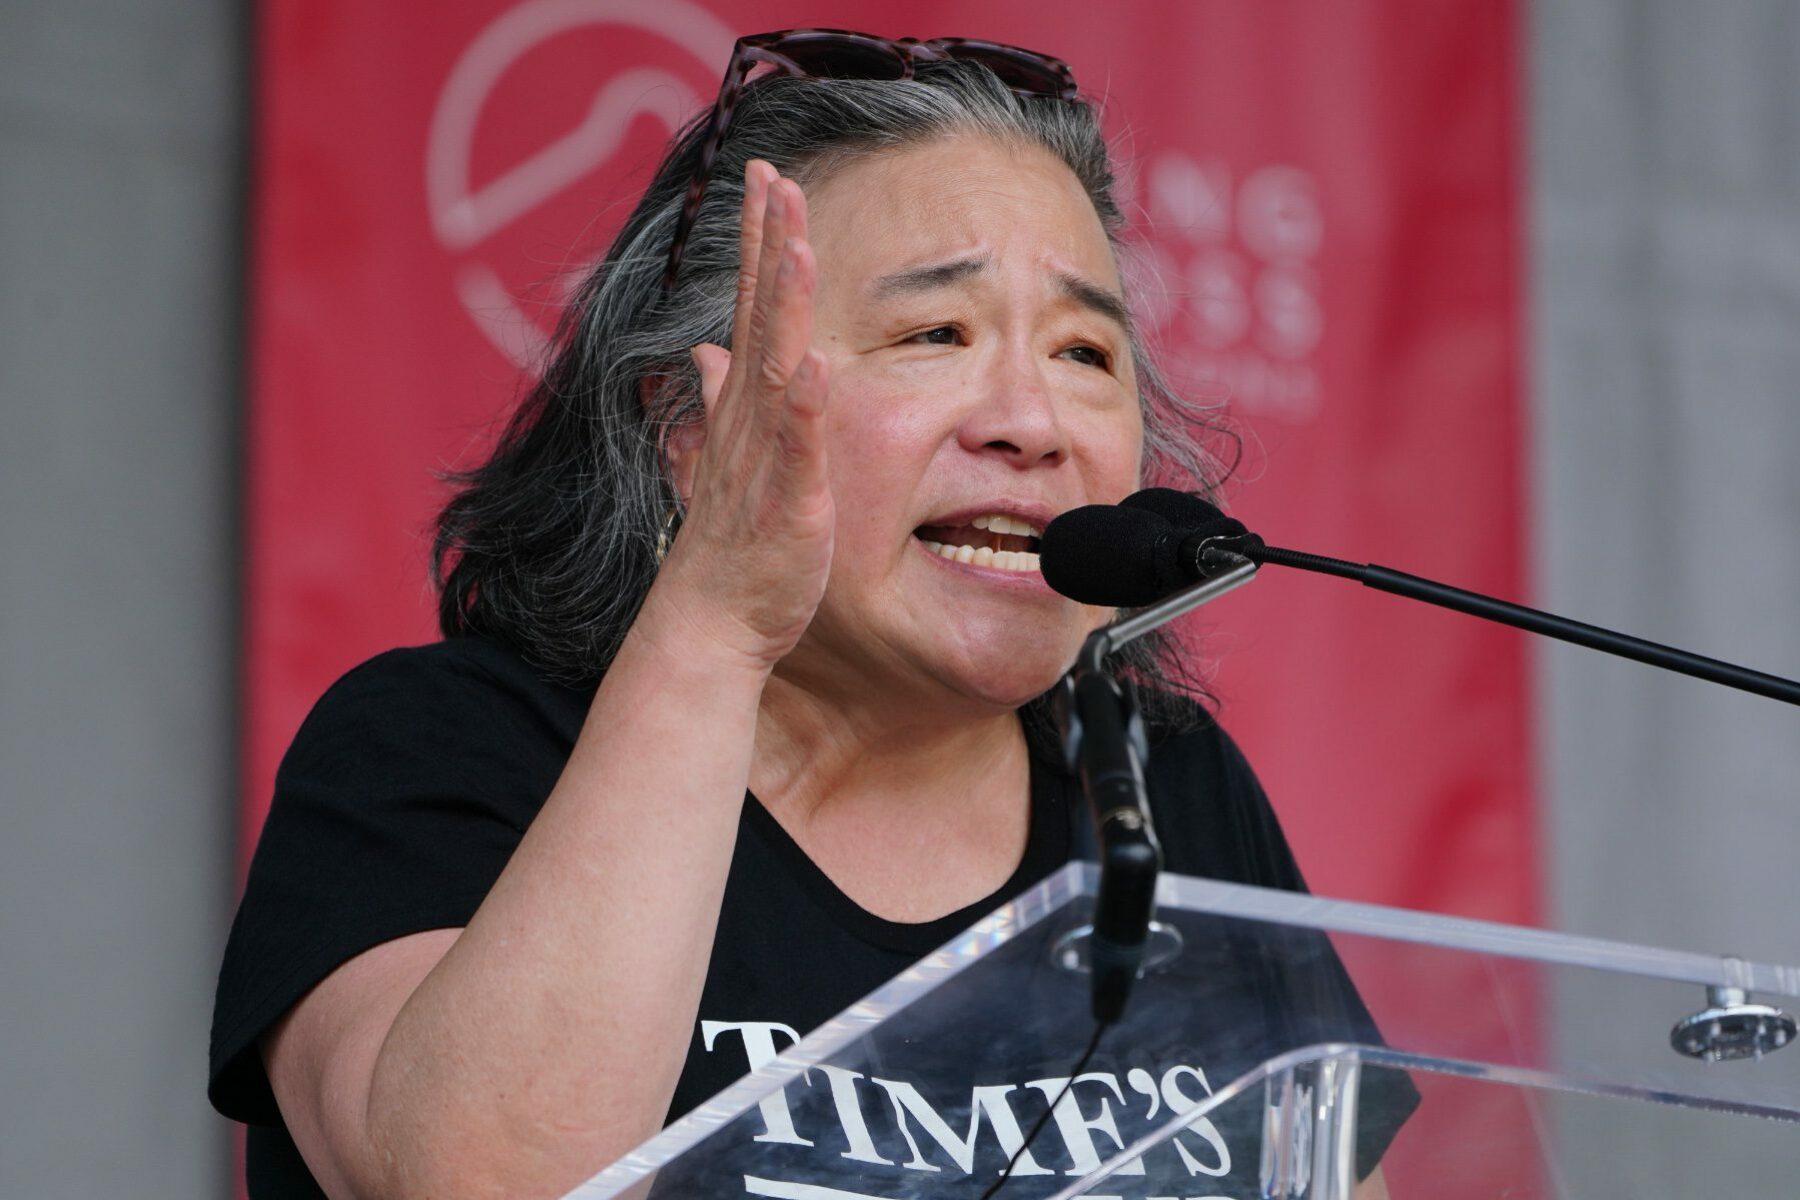 Tina Tchen speaking at an event.